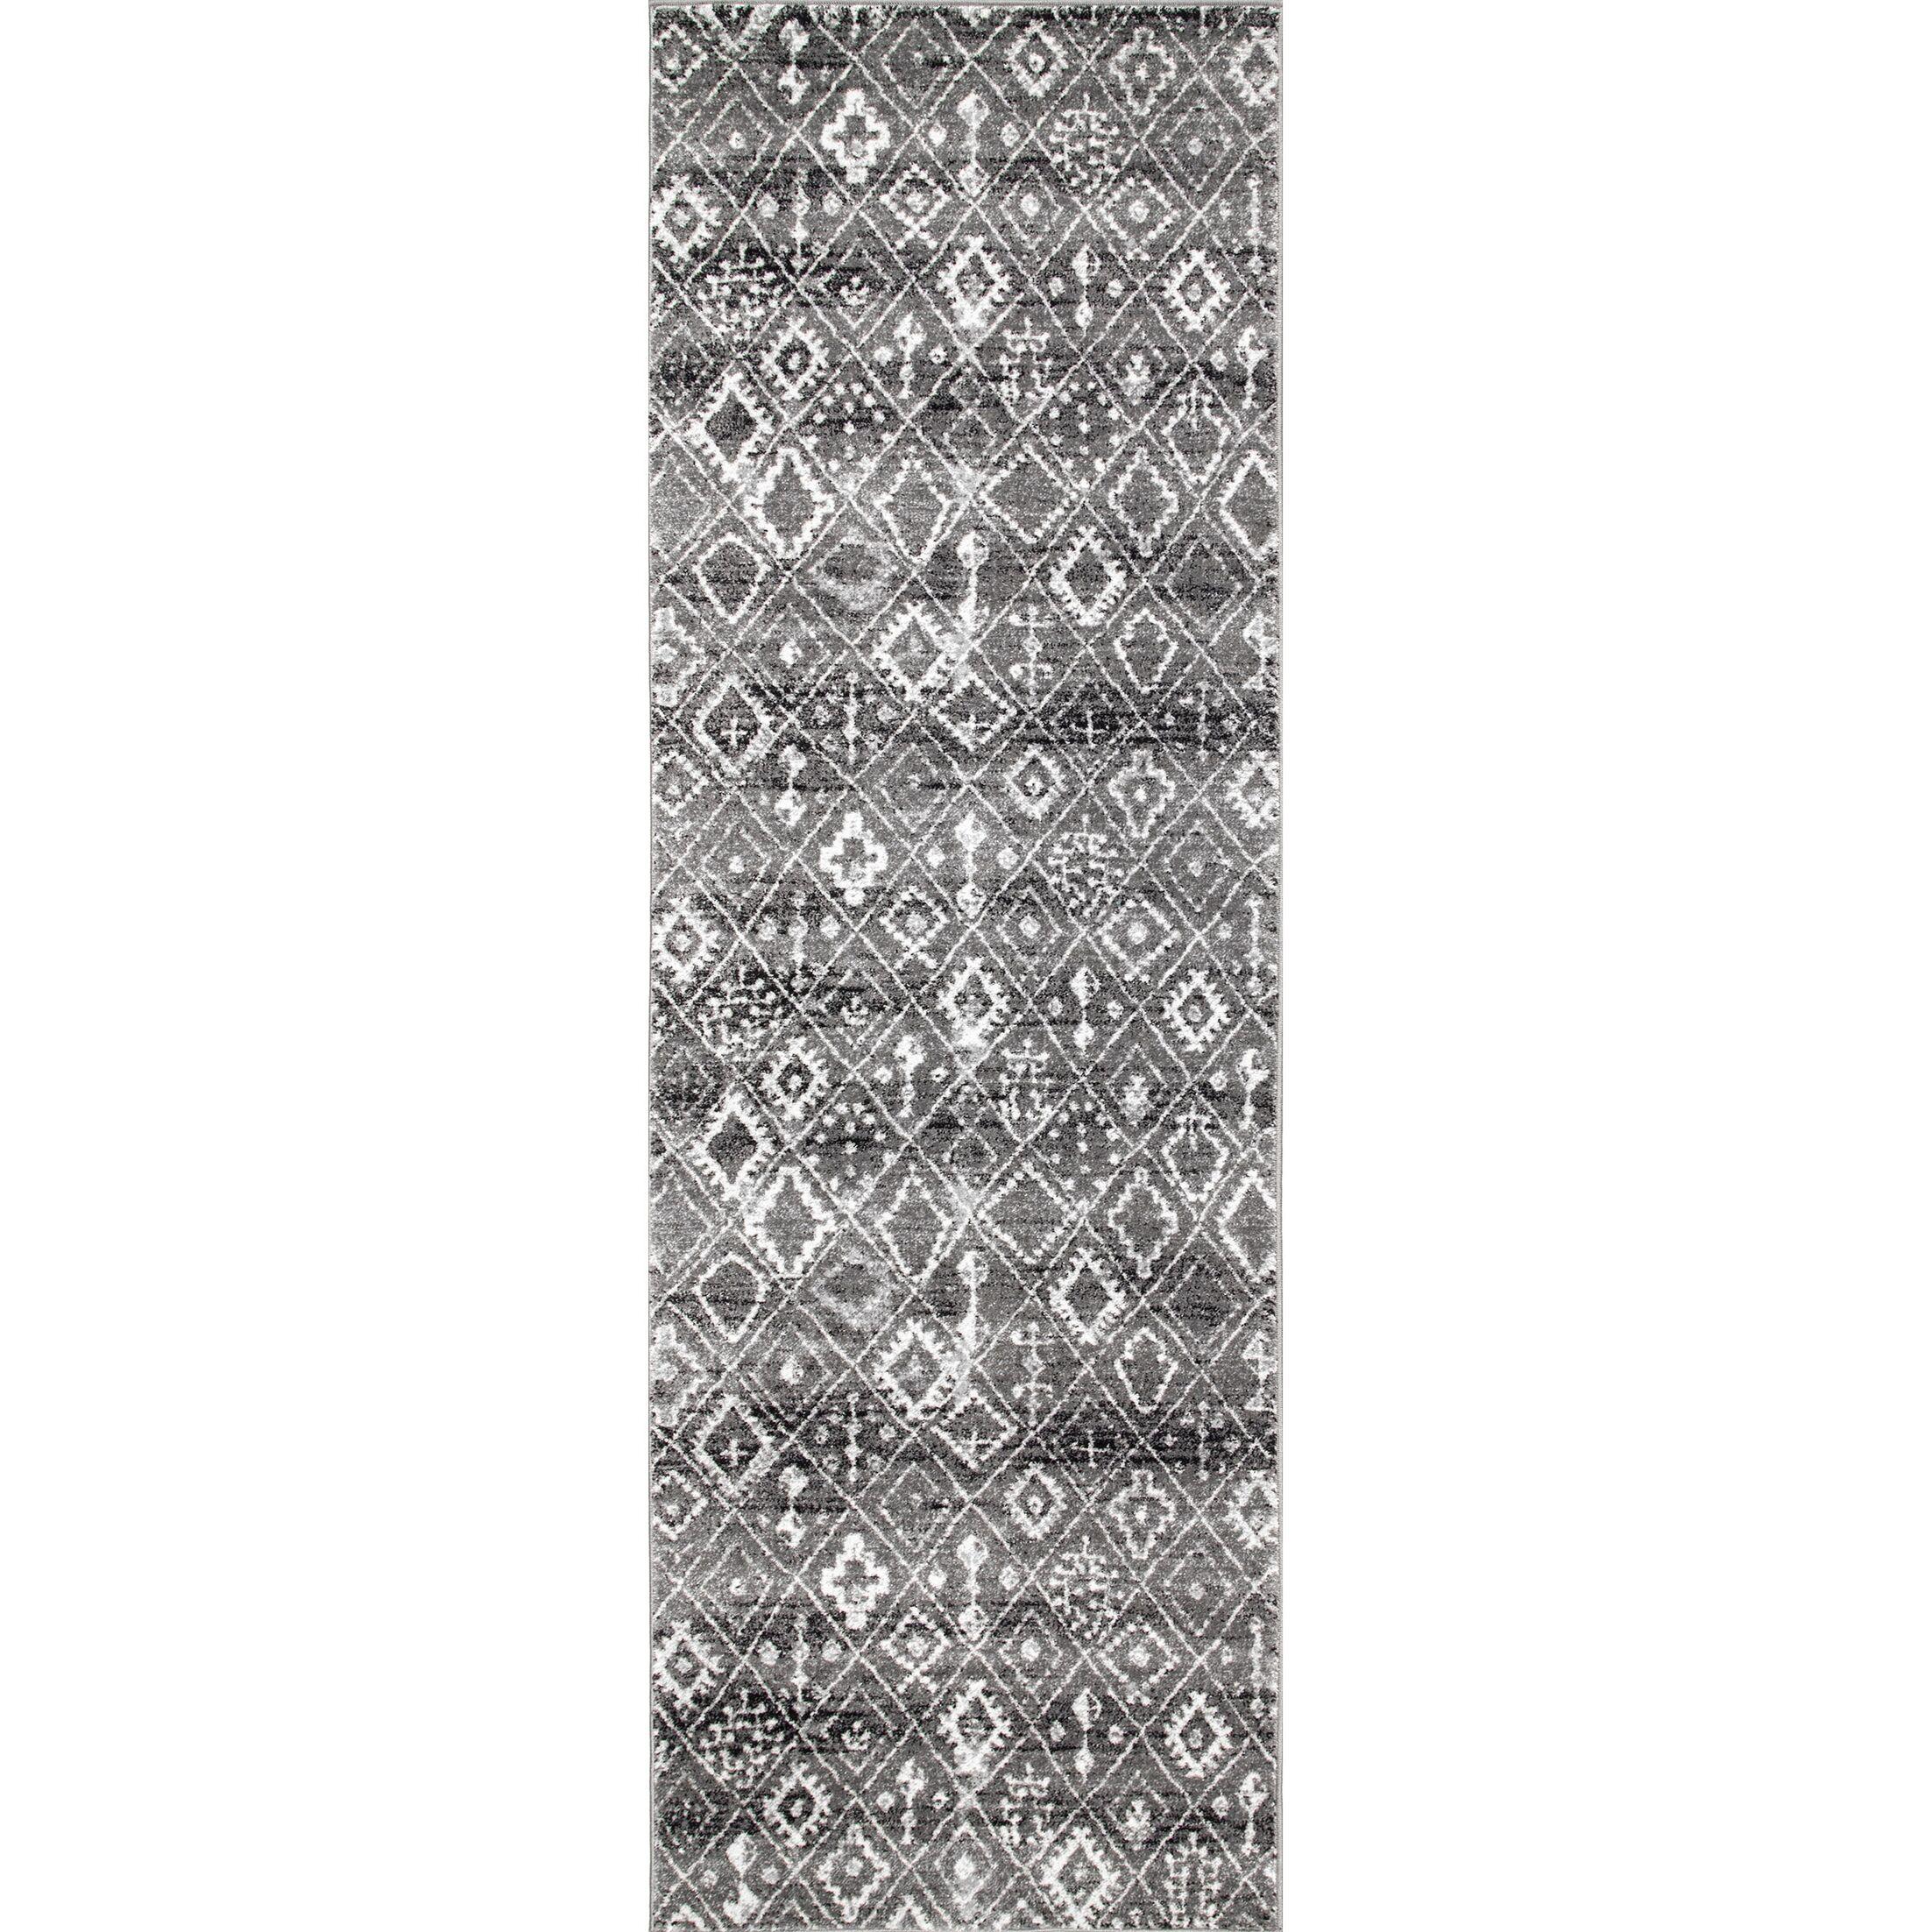 Cauley Dark Gray Area Rug Rug Size: Runner 2'8